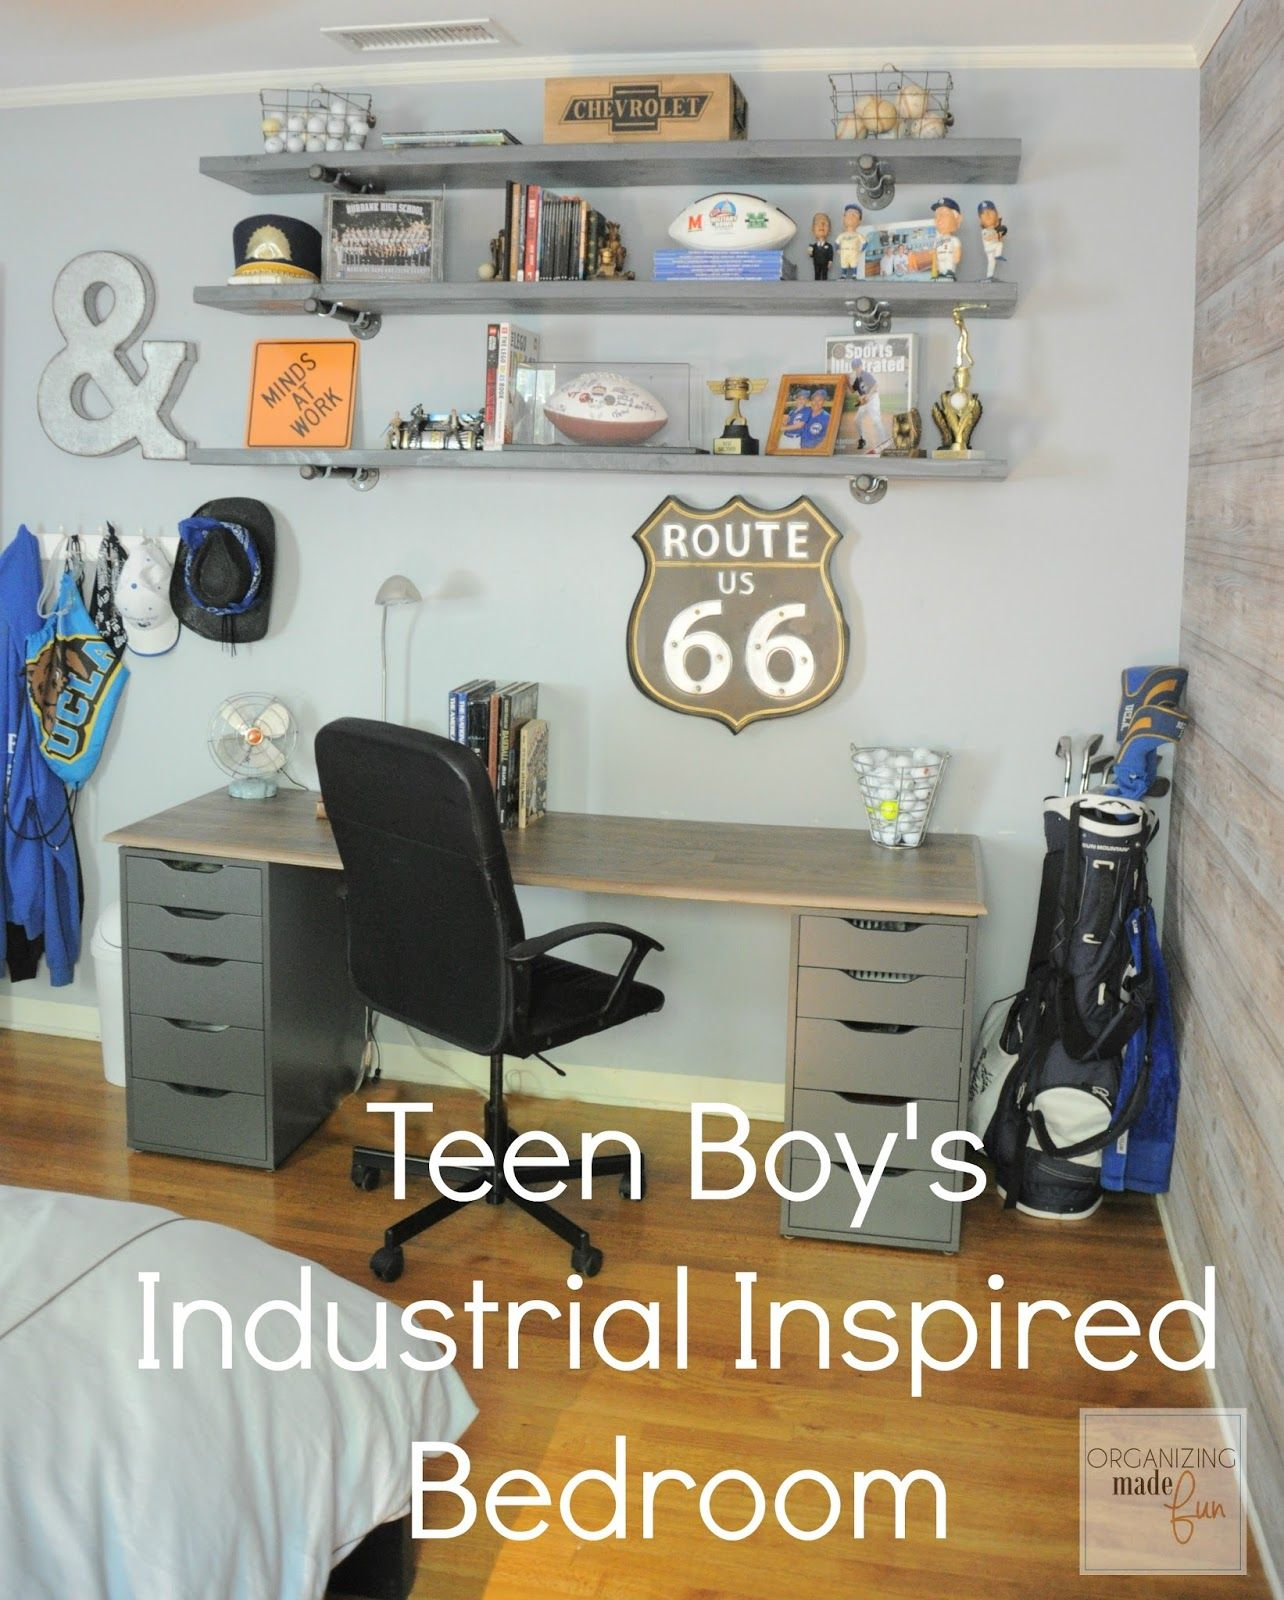 Teen Boy's Room Industrial Shelving :: OrganizingMadeFun